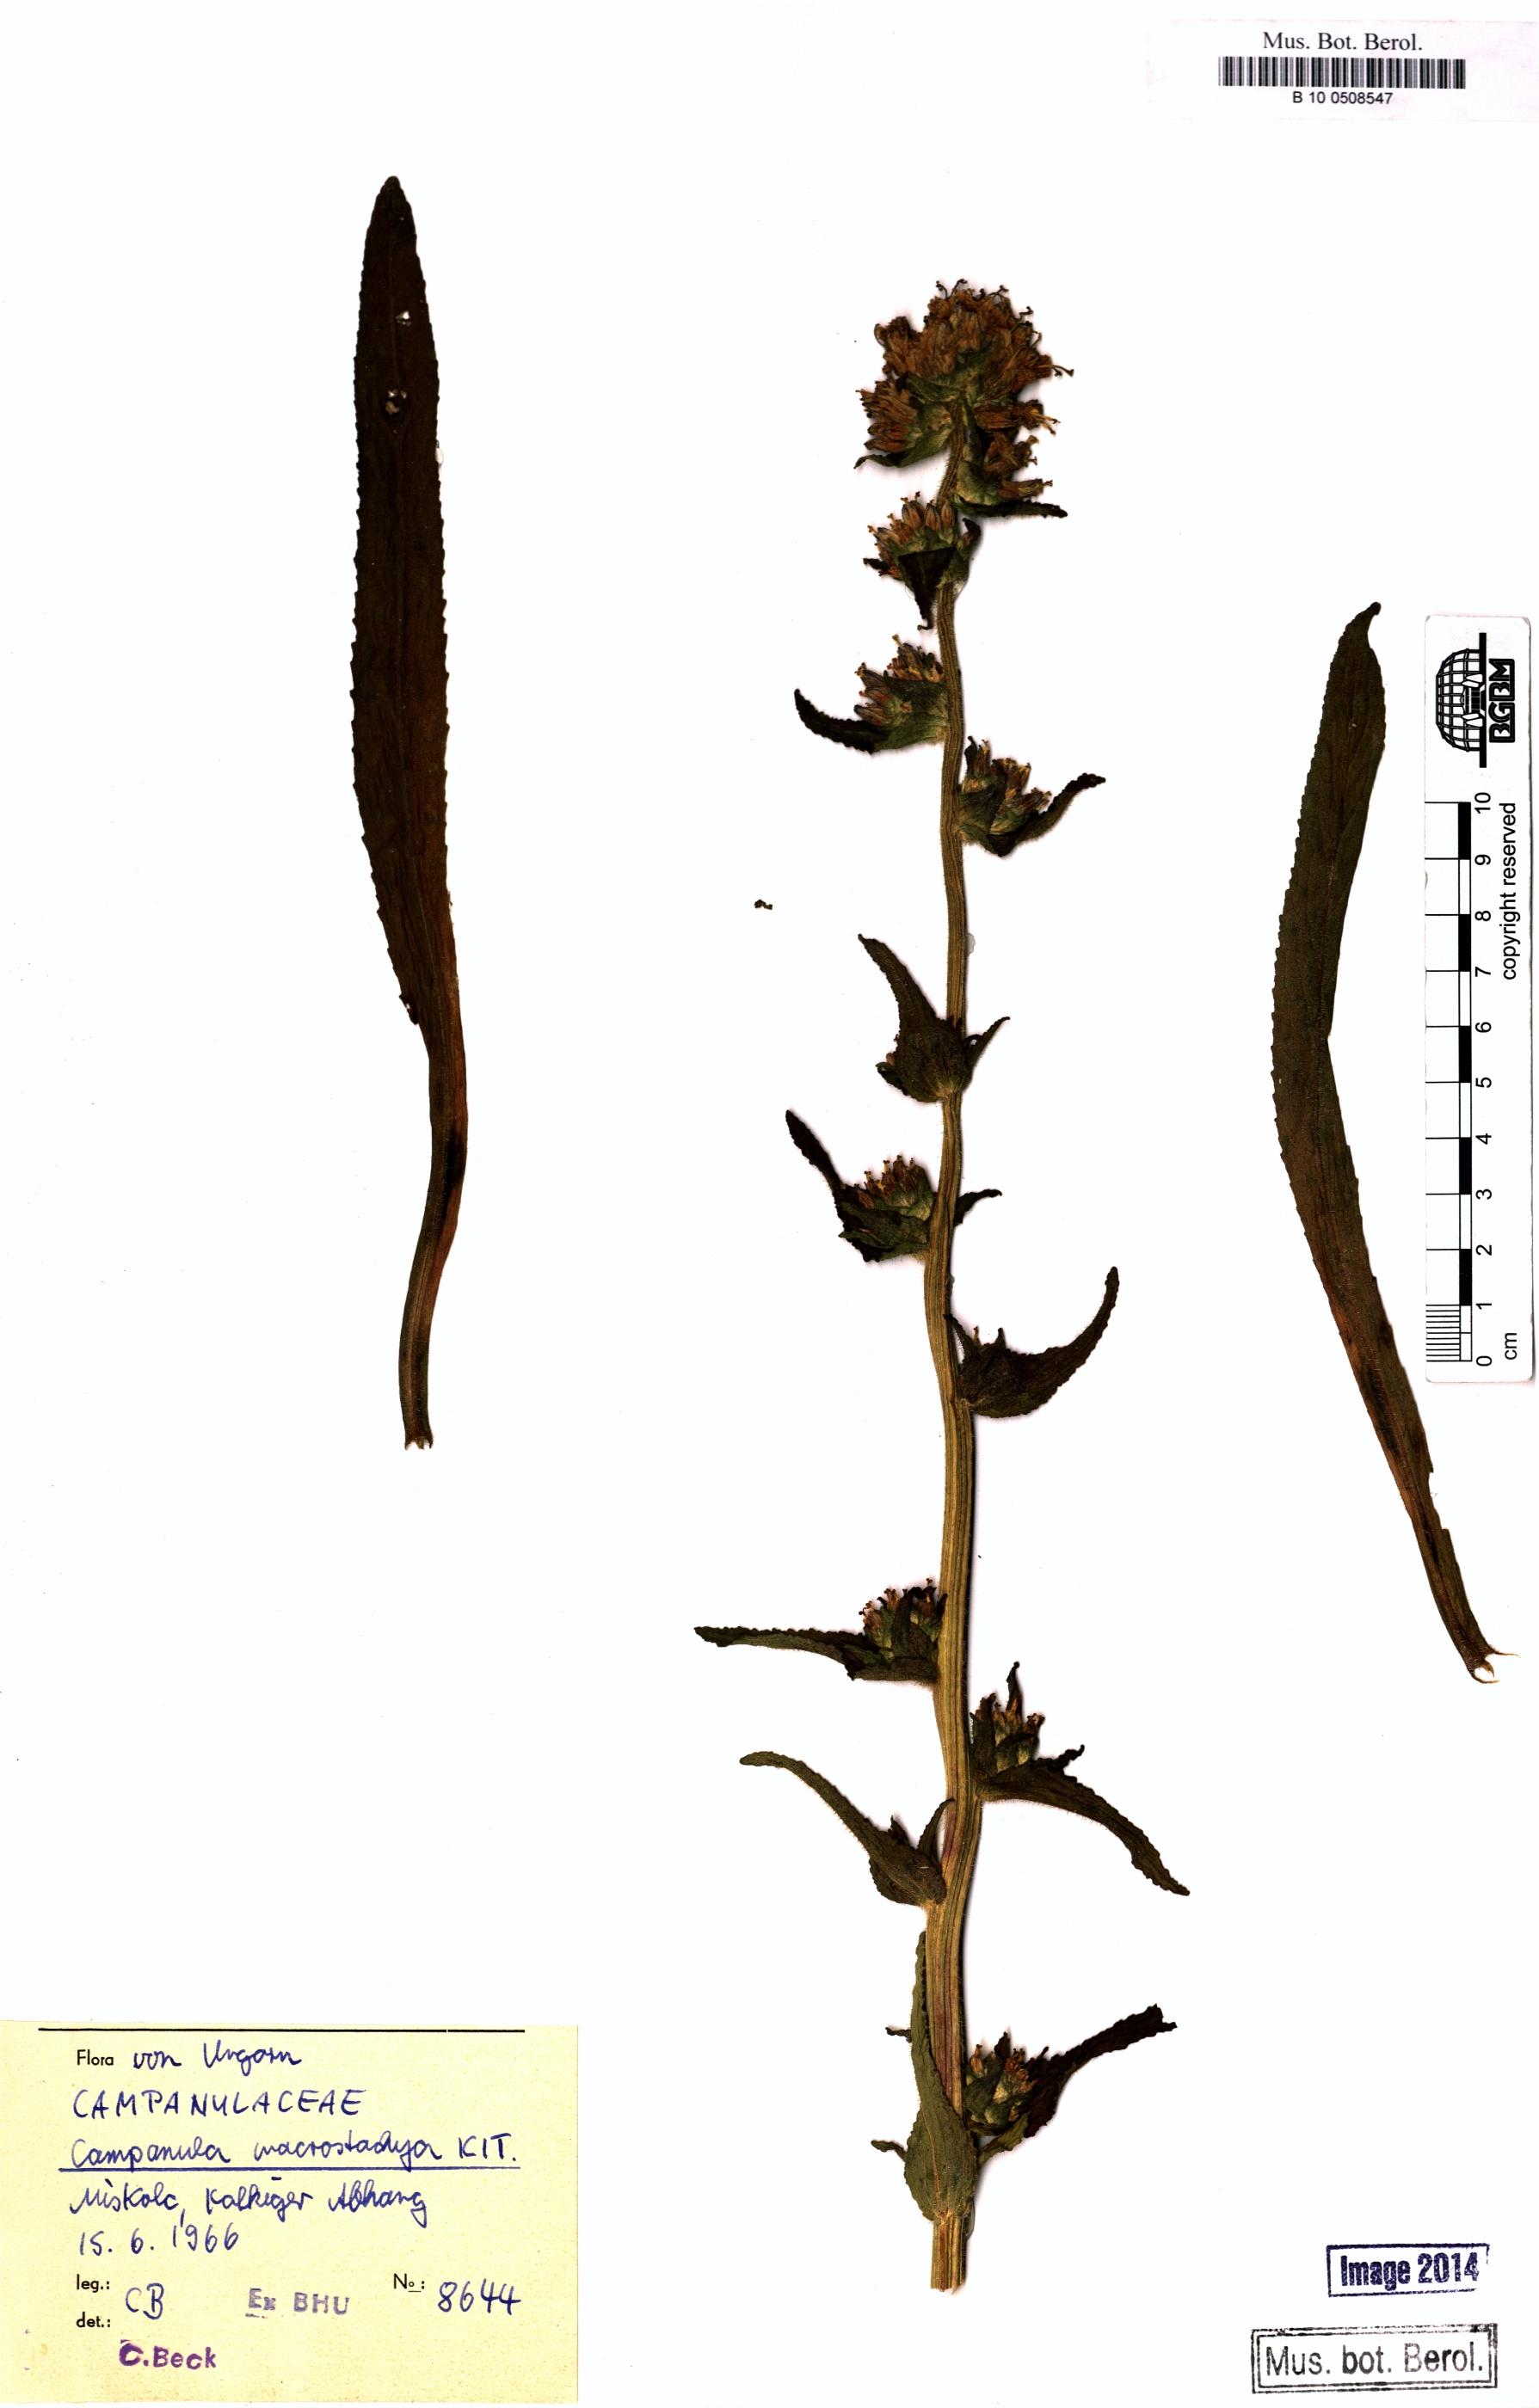 http://ww2.bgbm.org/herbarium/images/B/10/05/08/54/B_10_0508547.jpg